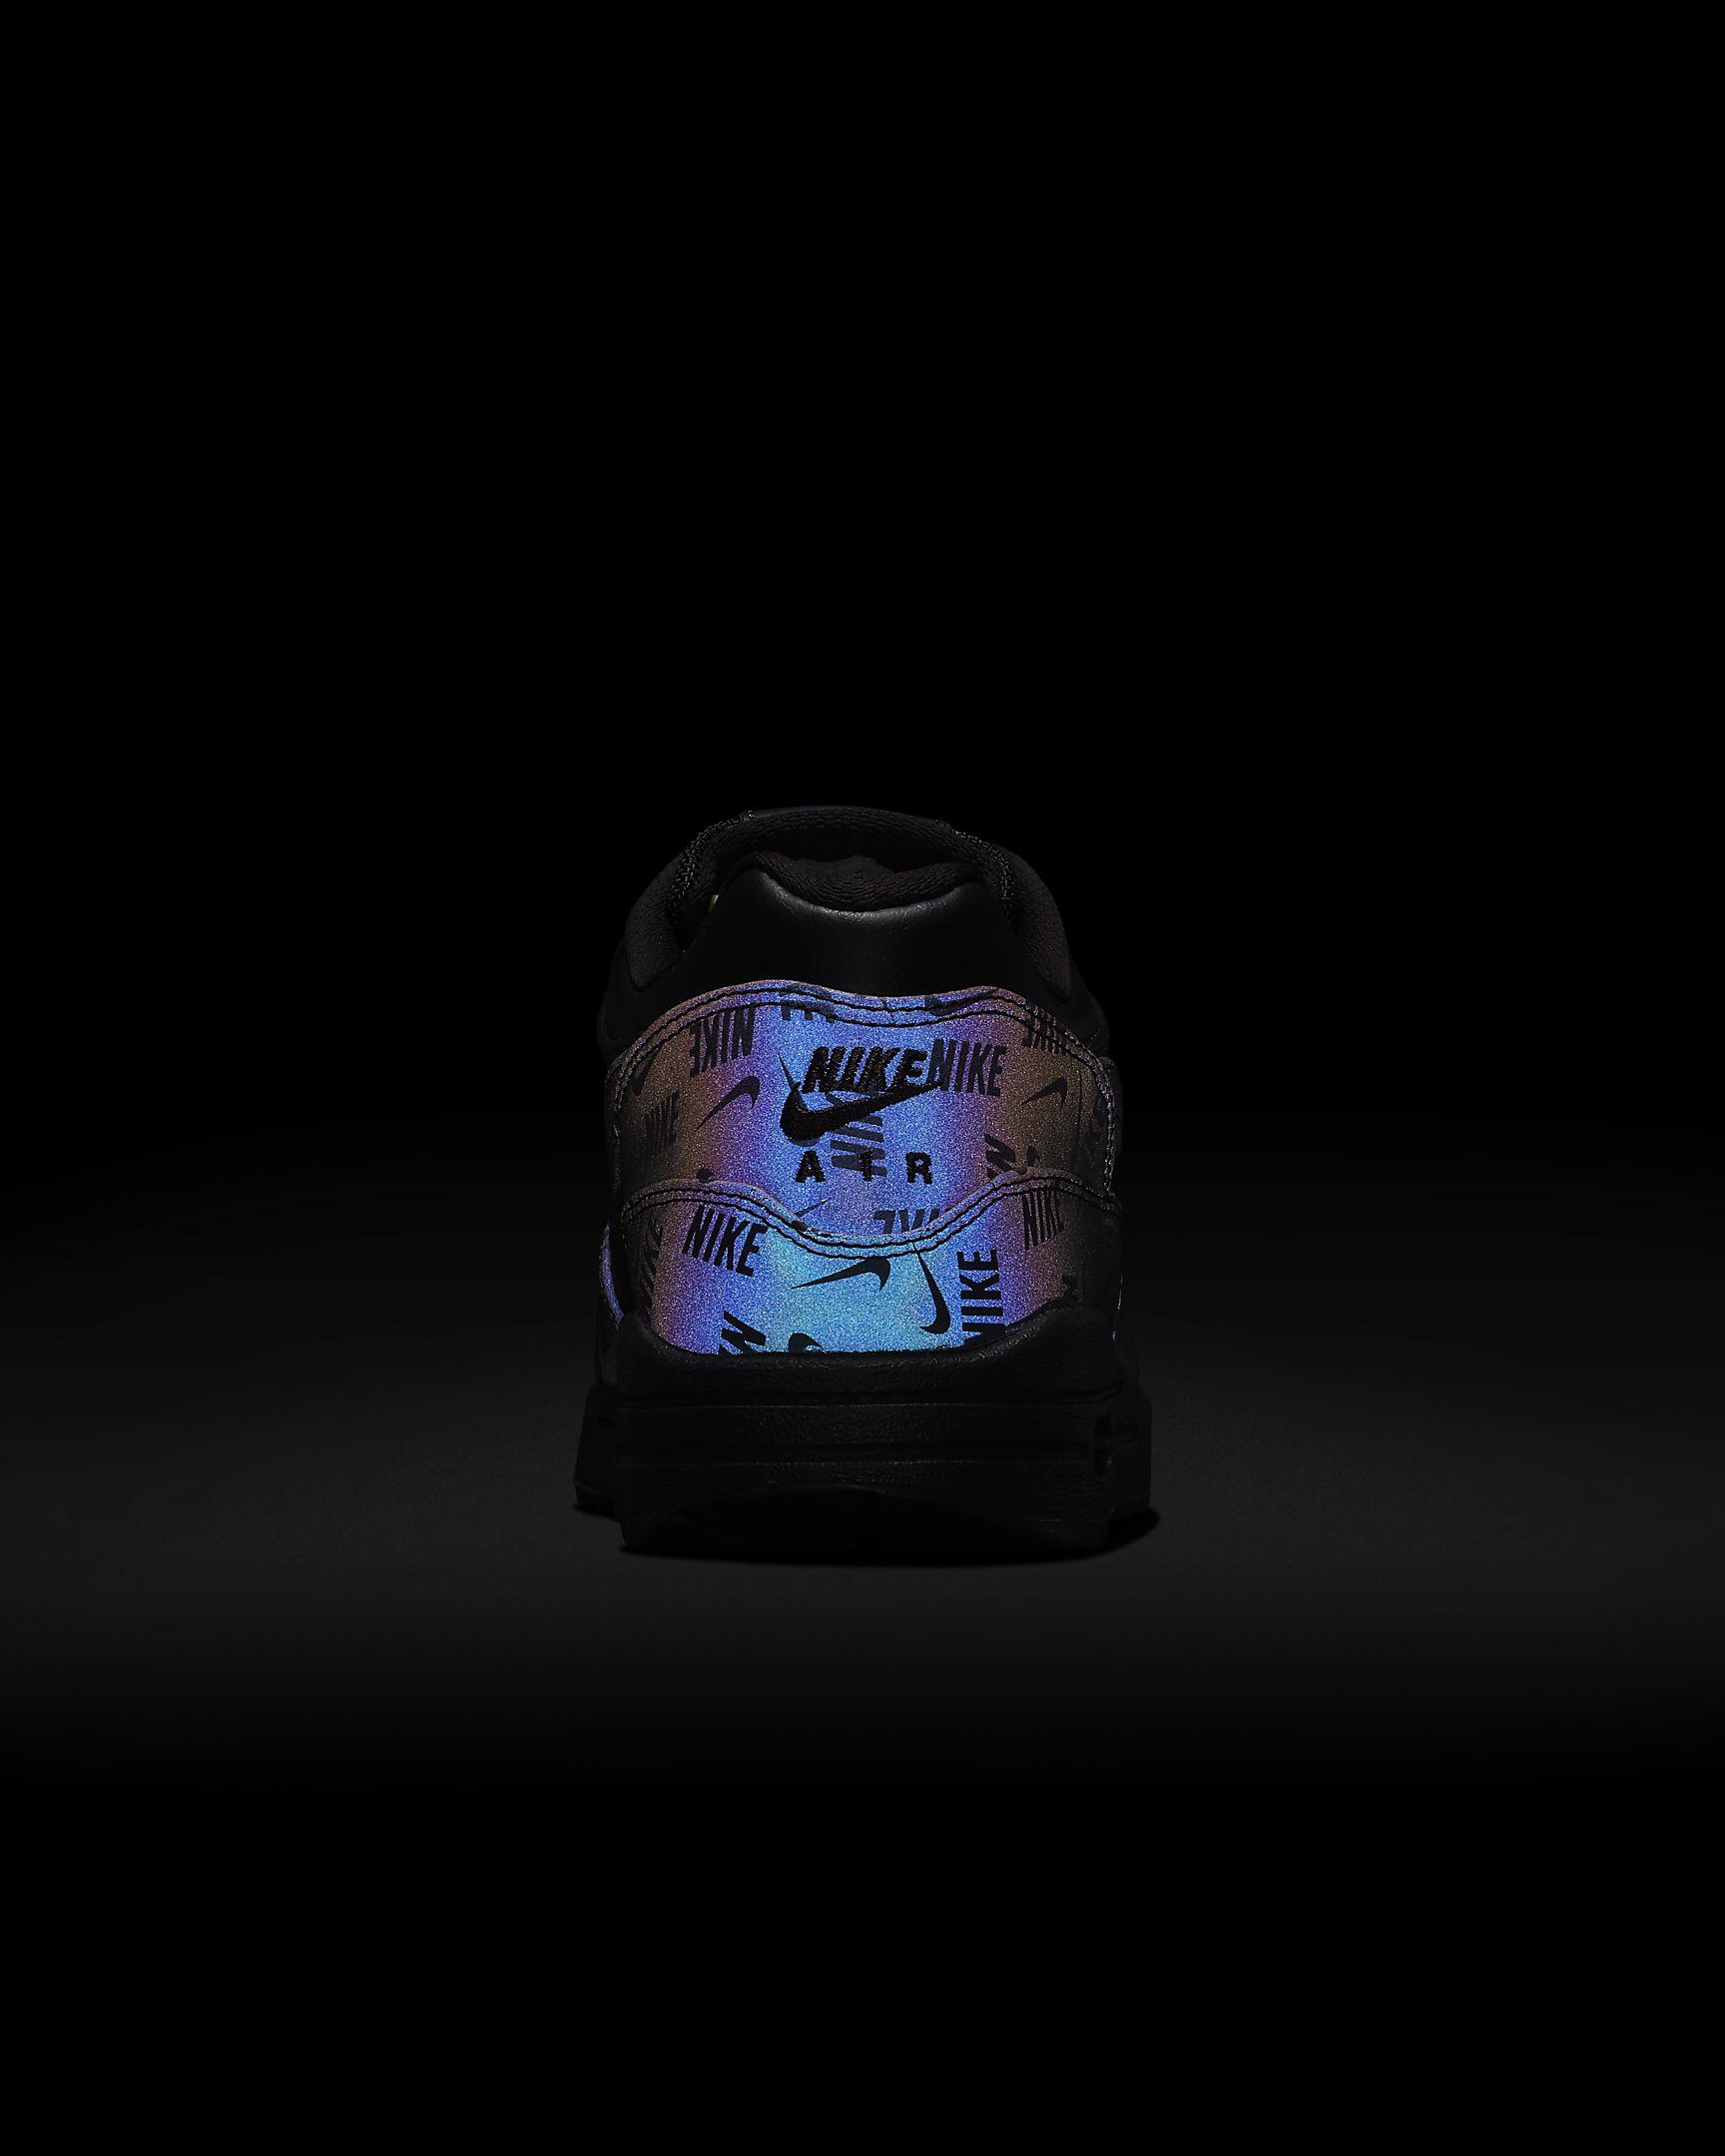 Nike Wmns Air Max 1 LX Glow in the Dark